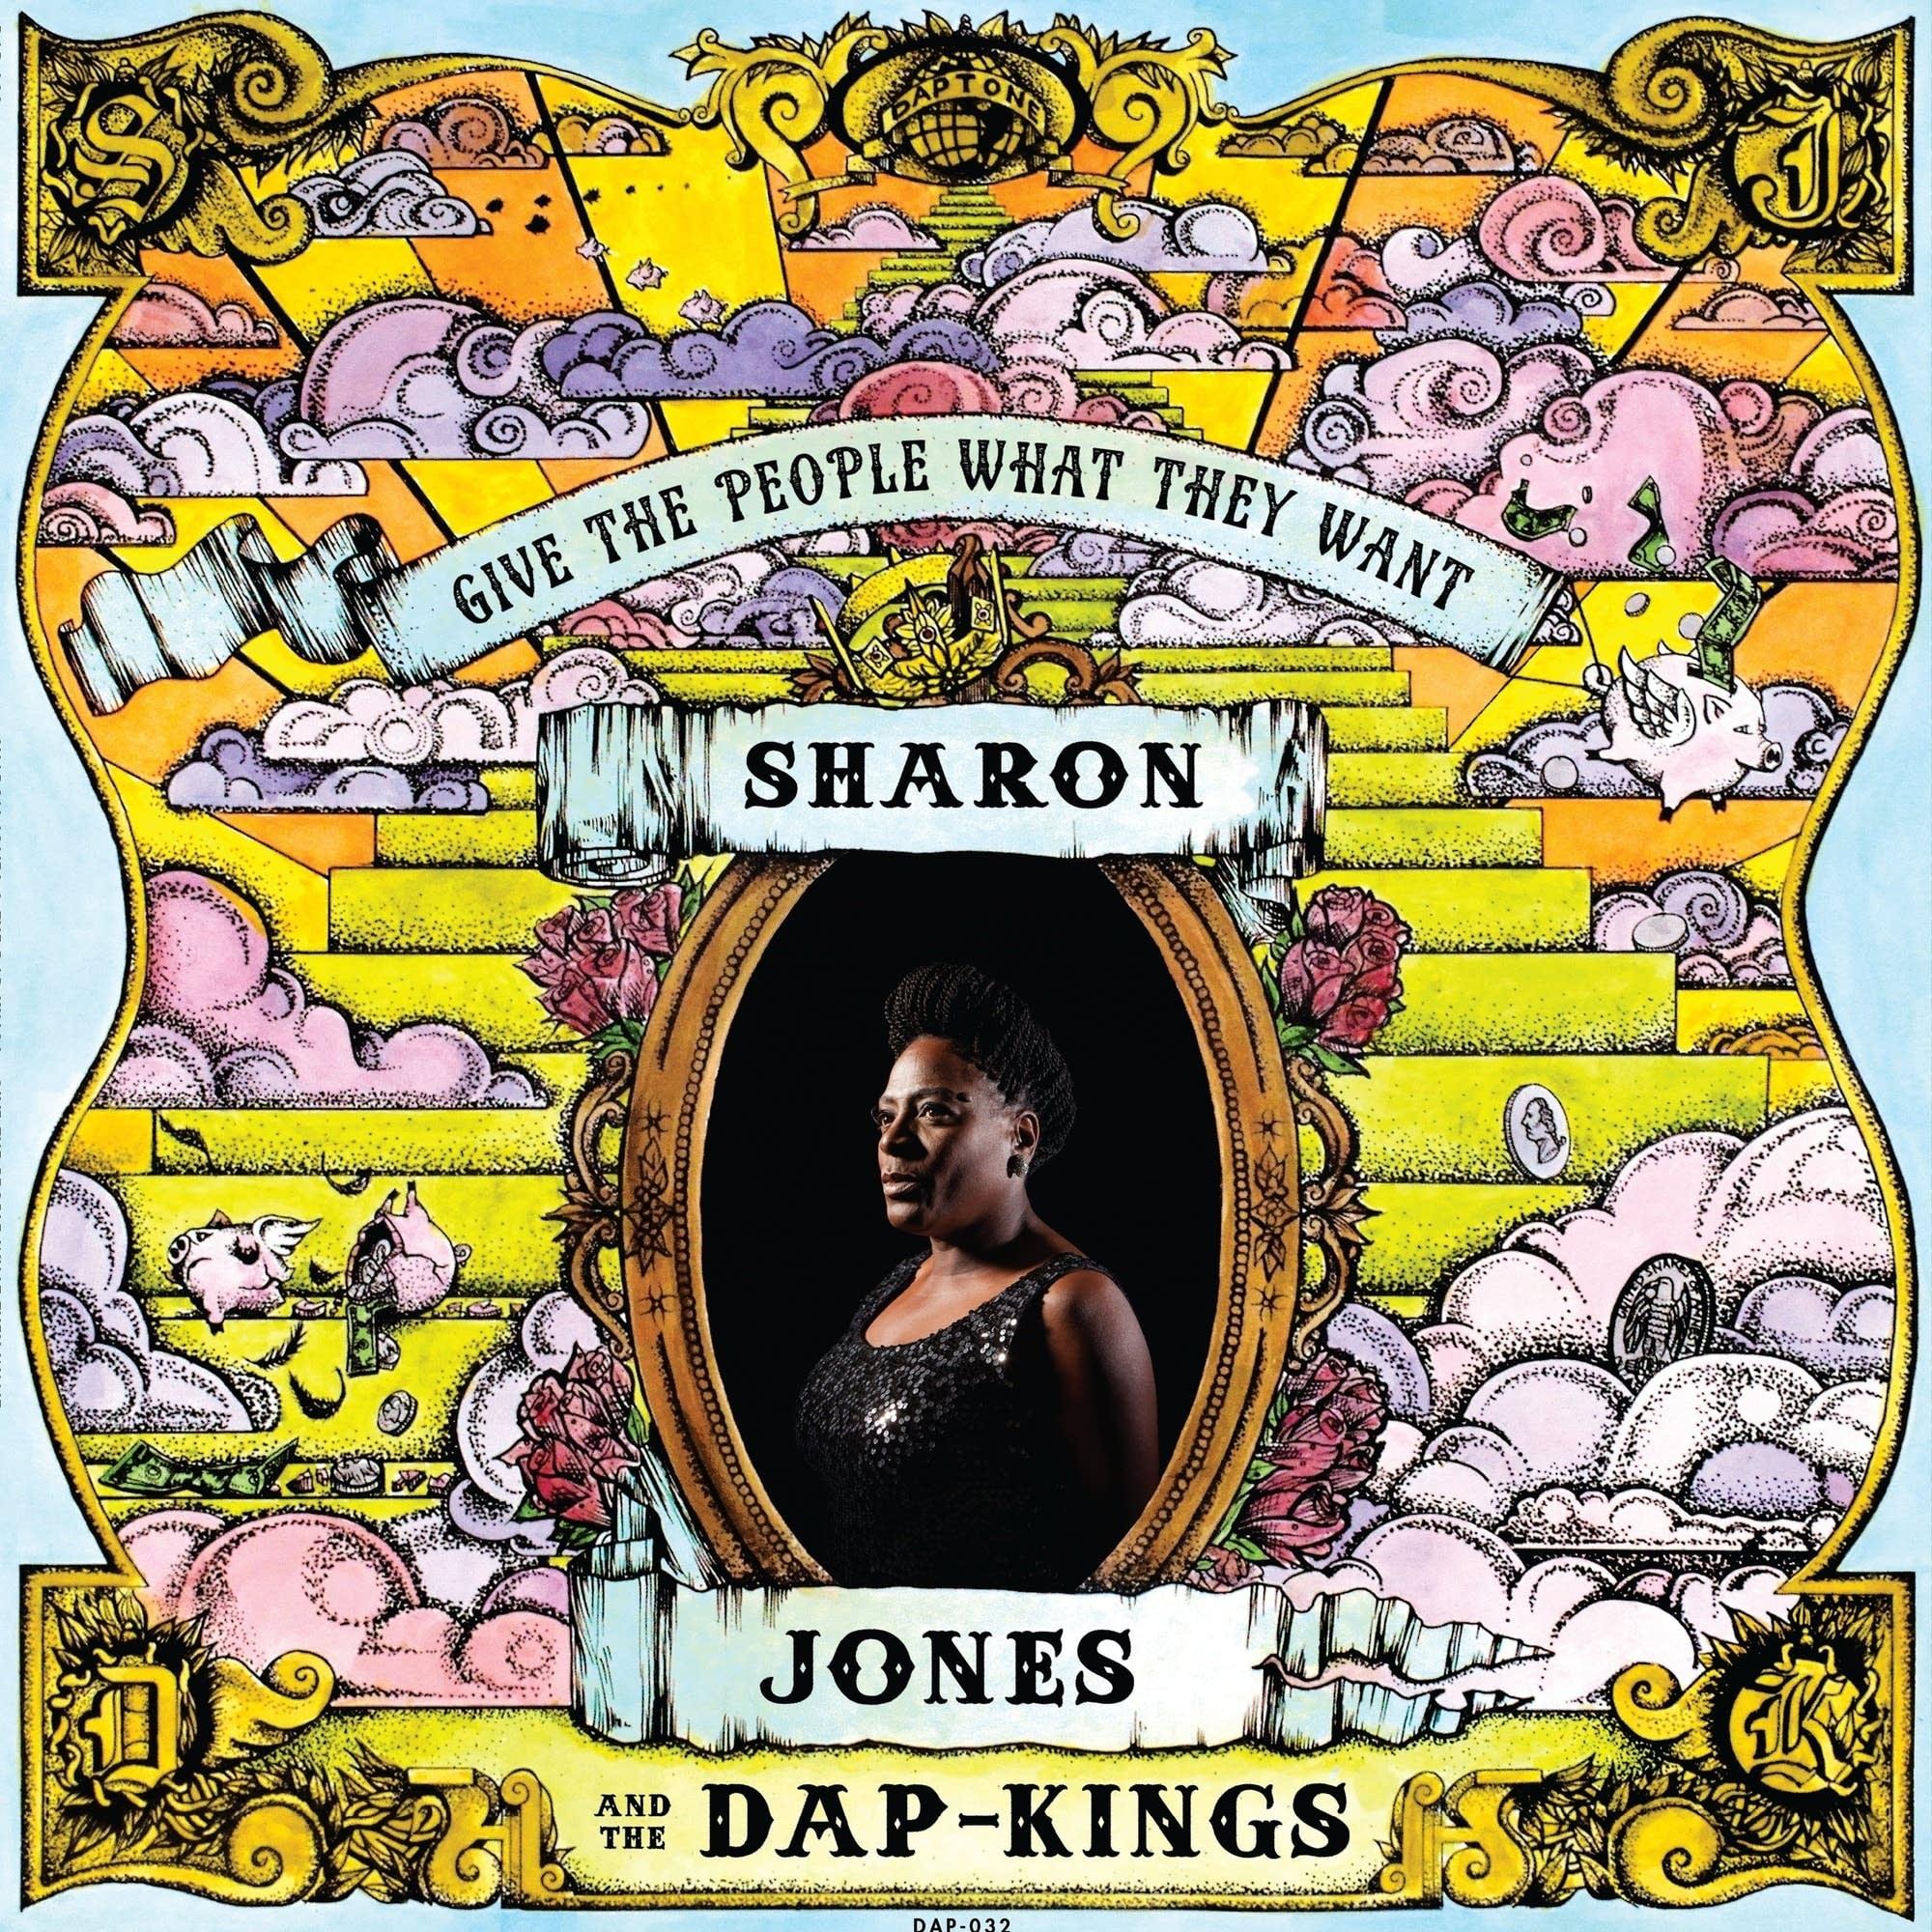 Sharon Jones and the Dap Kings